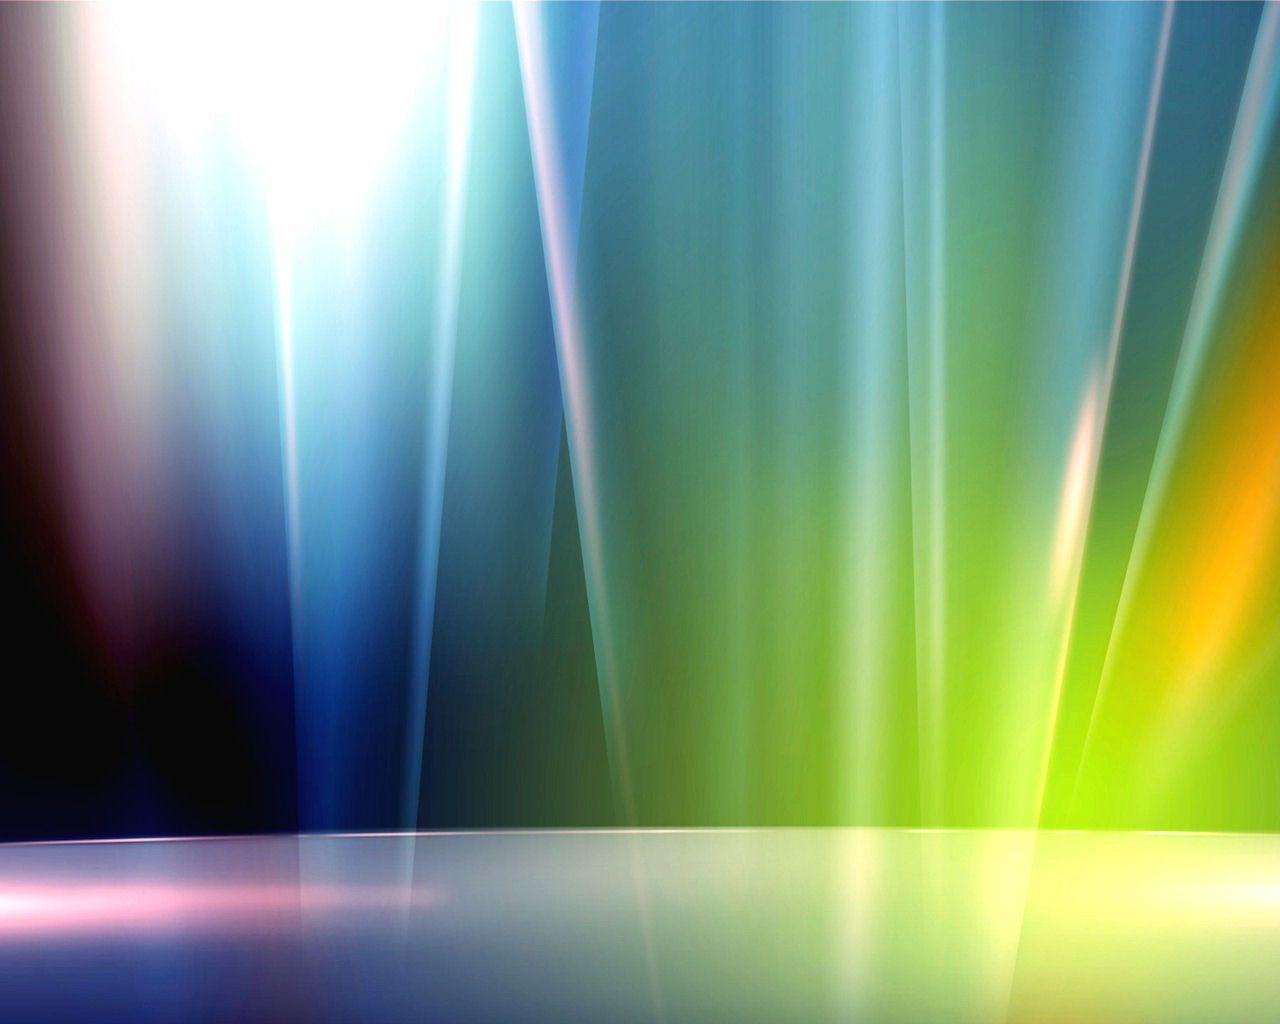 Windows vista aurora wallpaper wallpapers pinterest wallpaper windows vista aurora wallpaper voltagebd Images